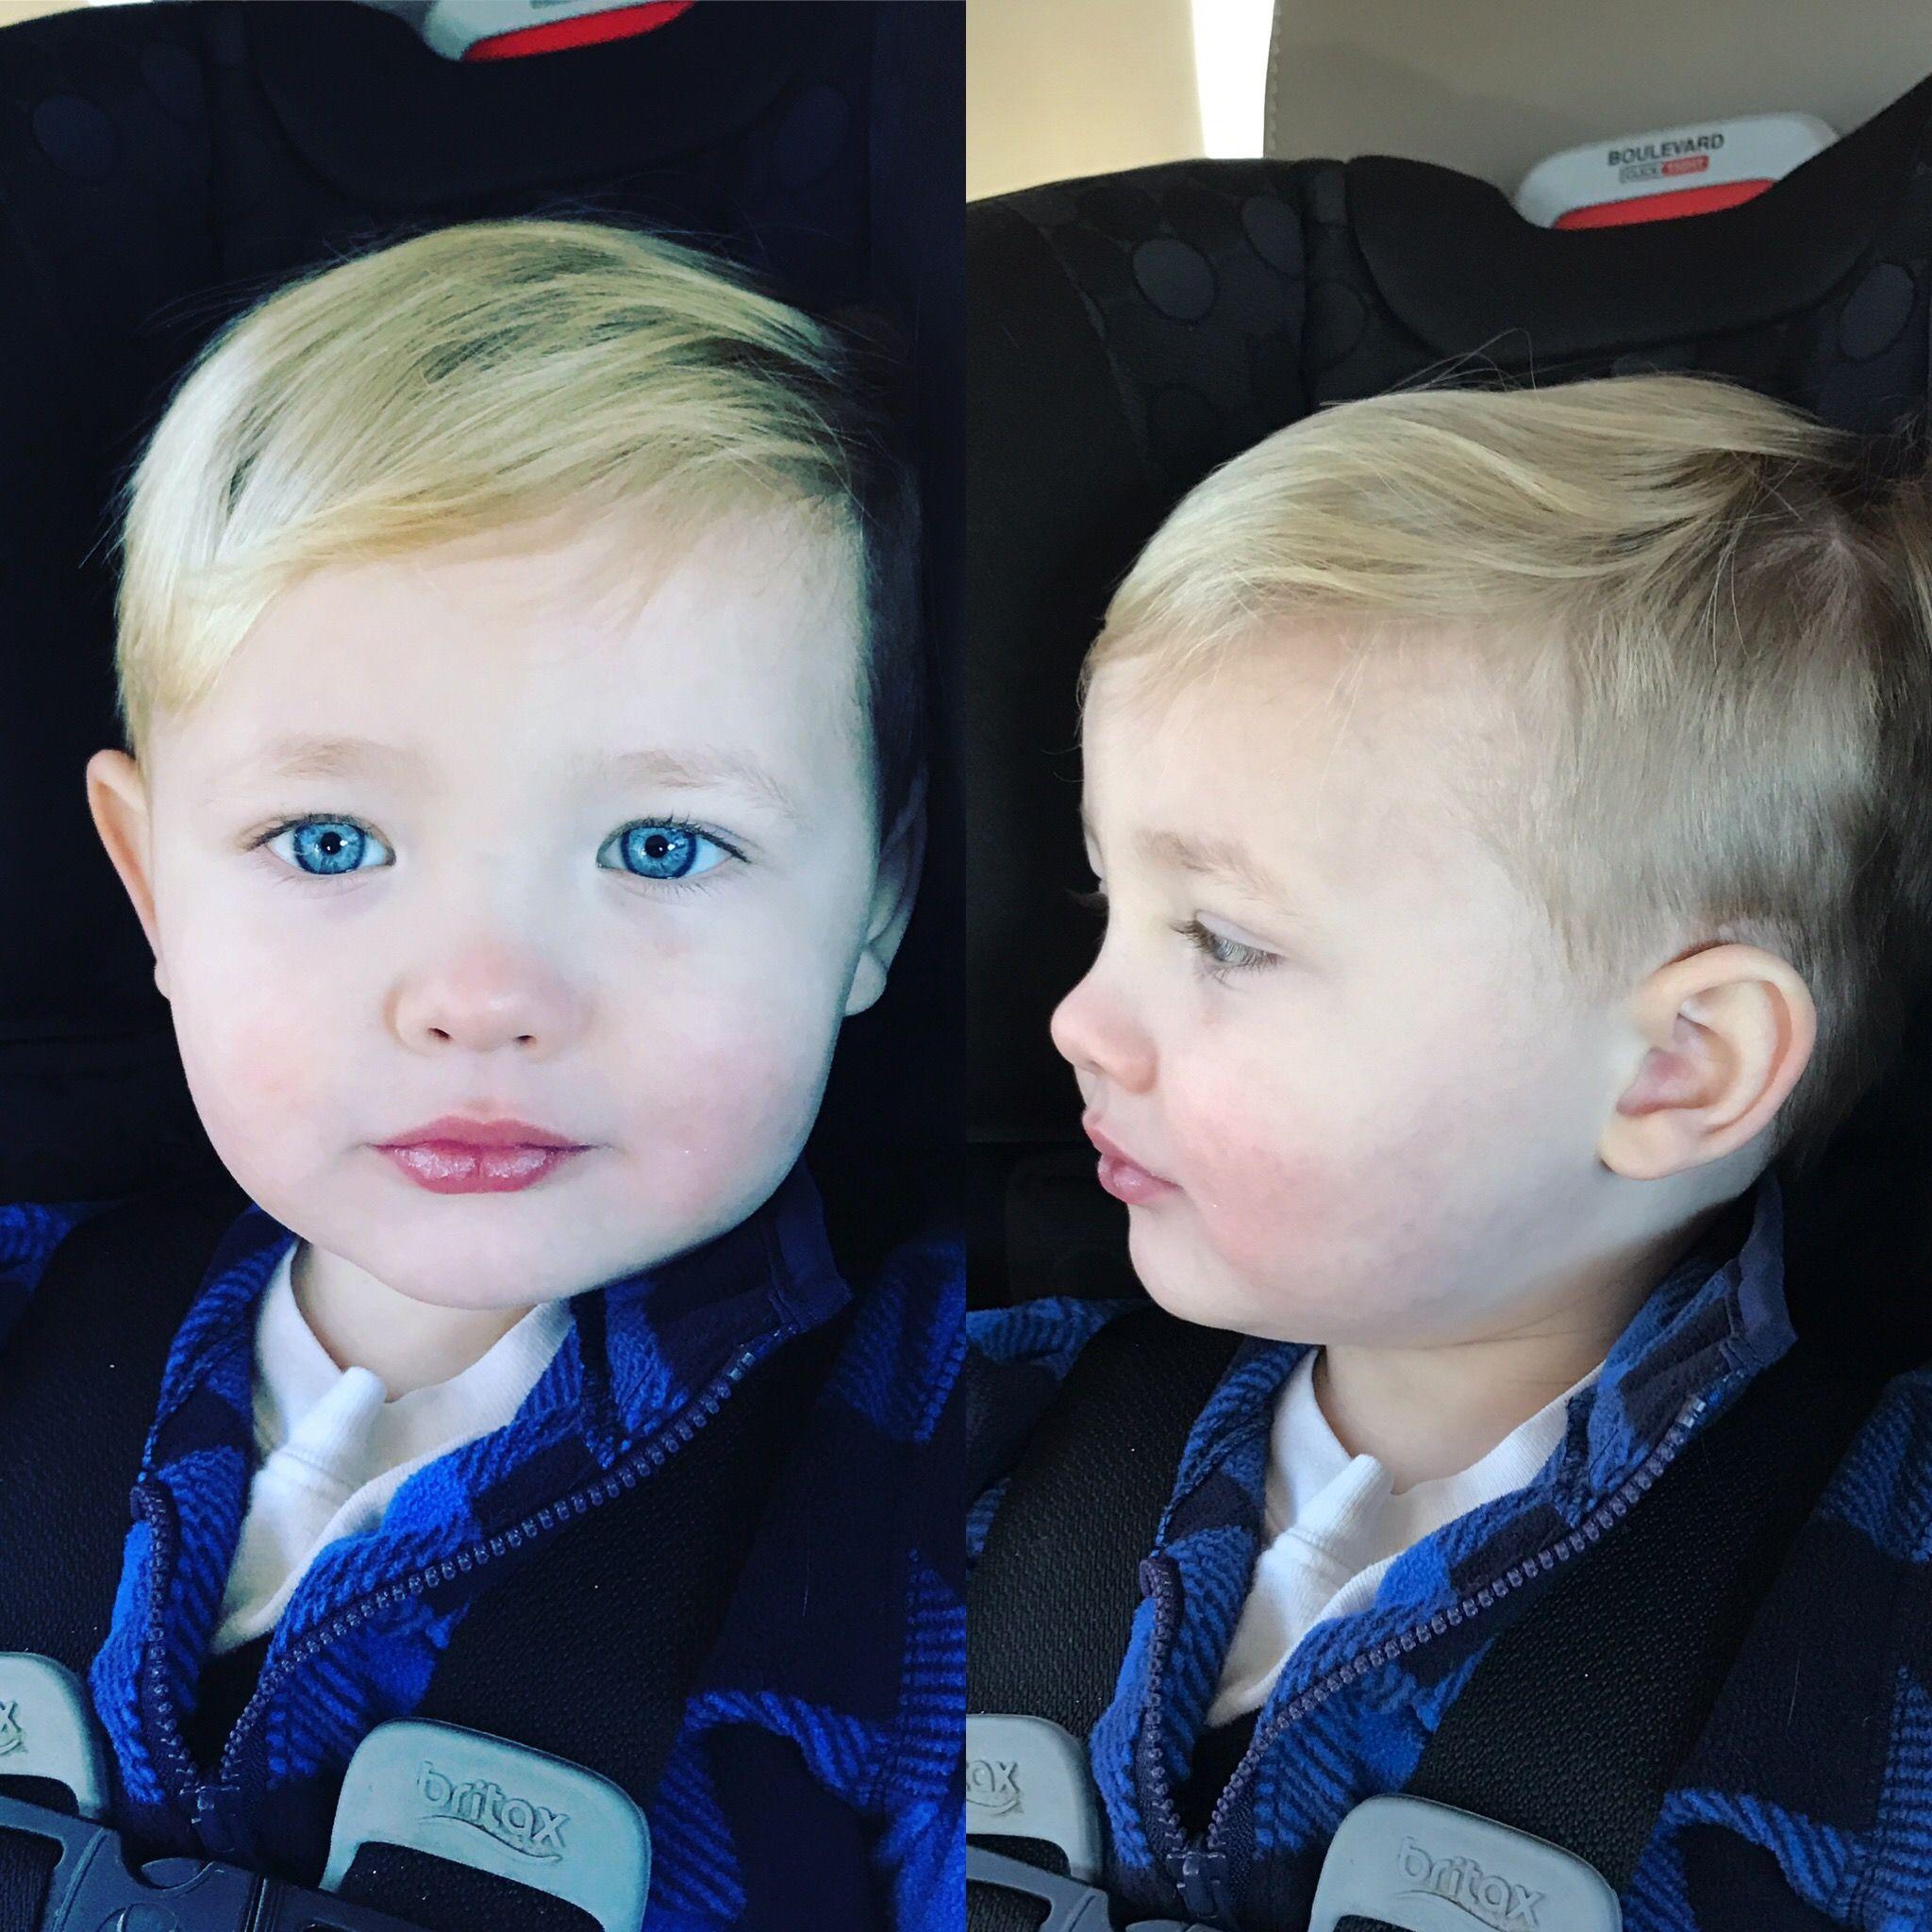 Baby hair blonde thin cut haircut hairstyle toddler 2017 boys 2